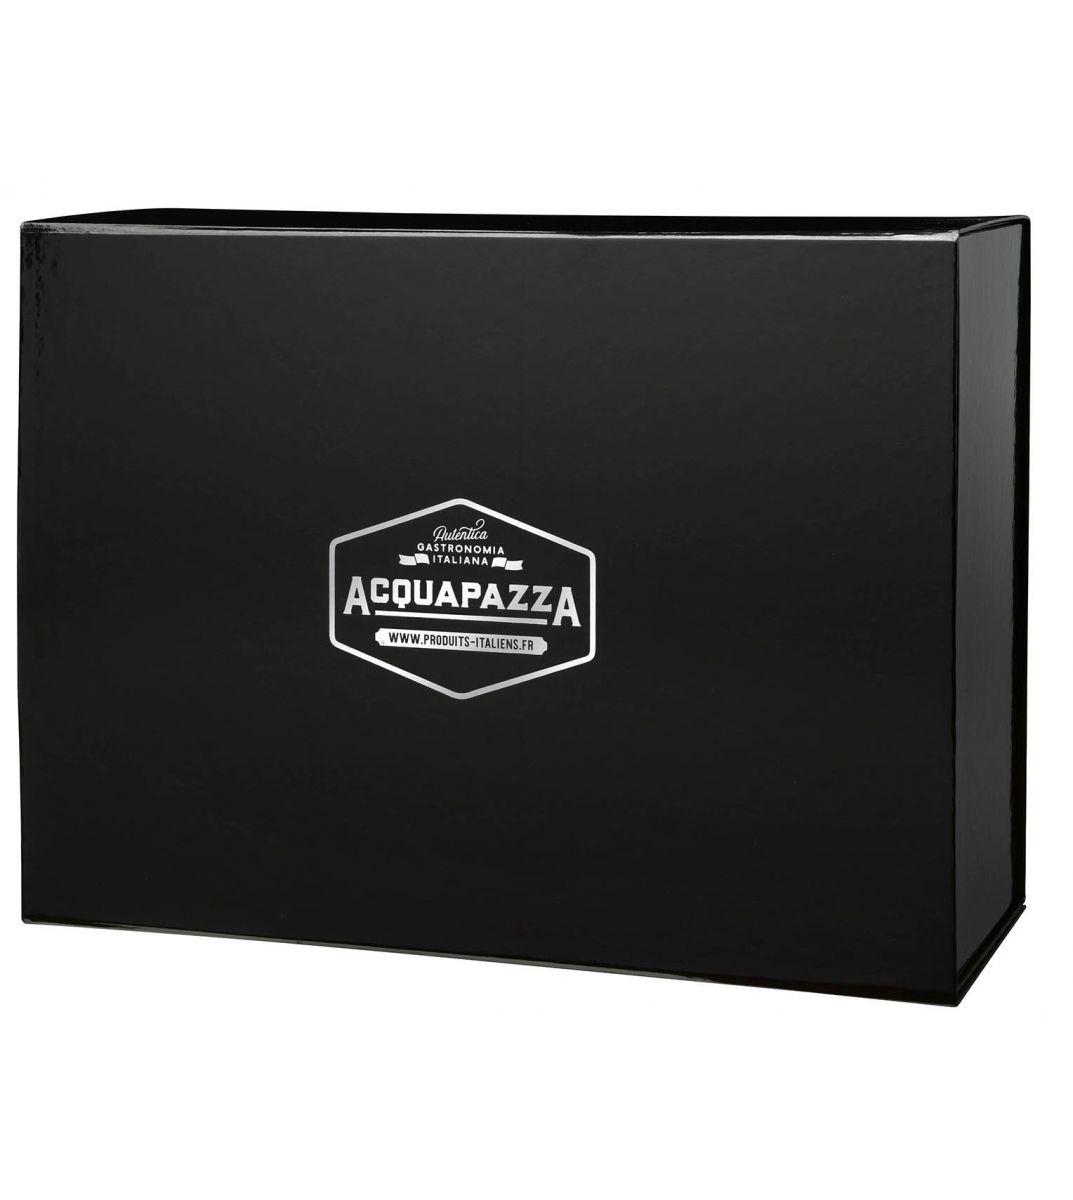 grande bo te cadeau acquapazza 30x40x15. Black Bedroom Furniture Sets. Home Design Ideas